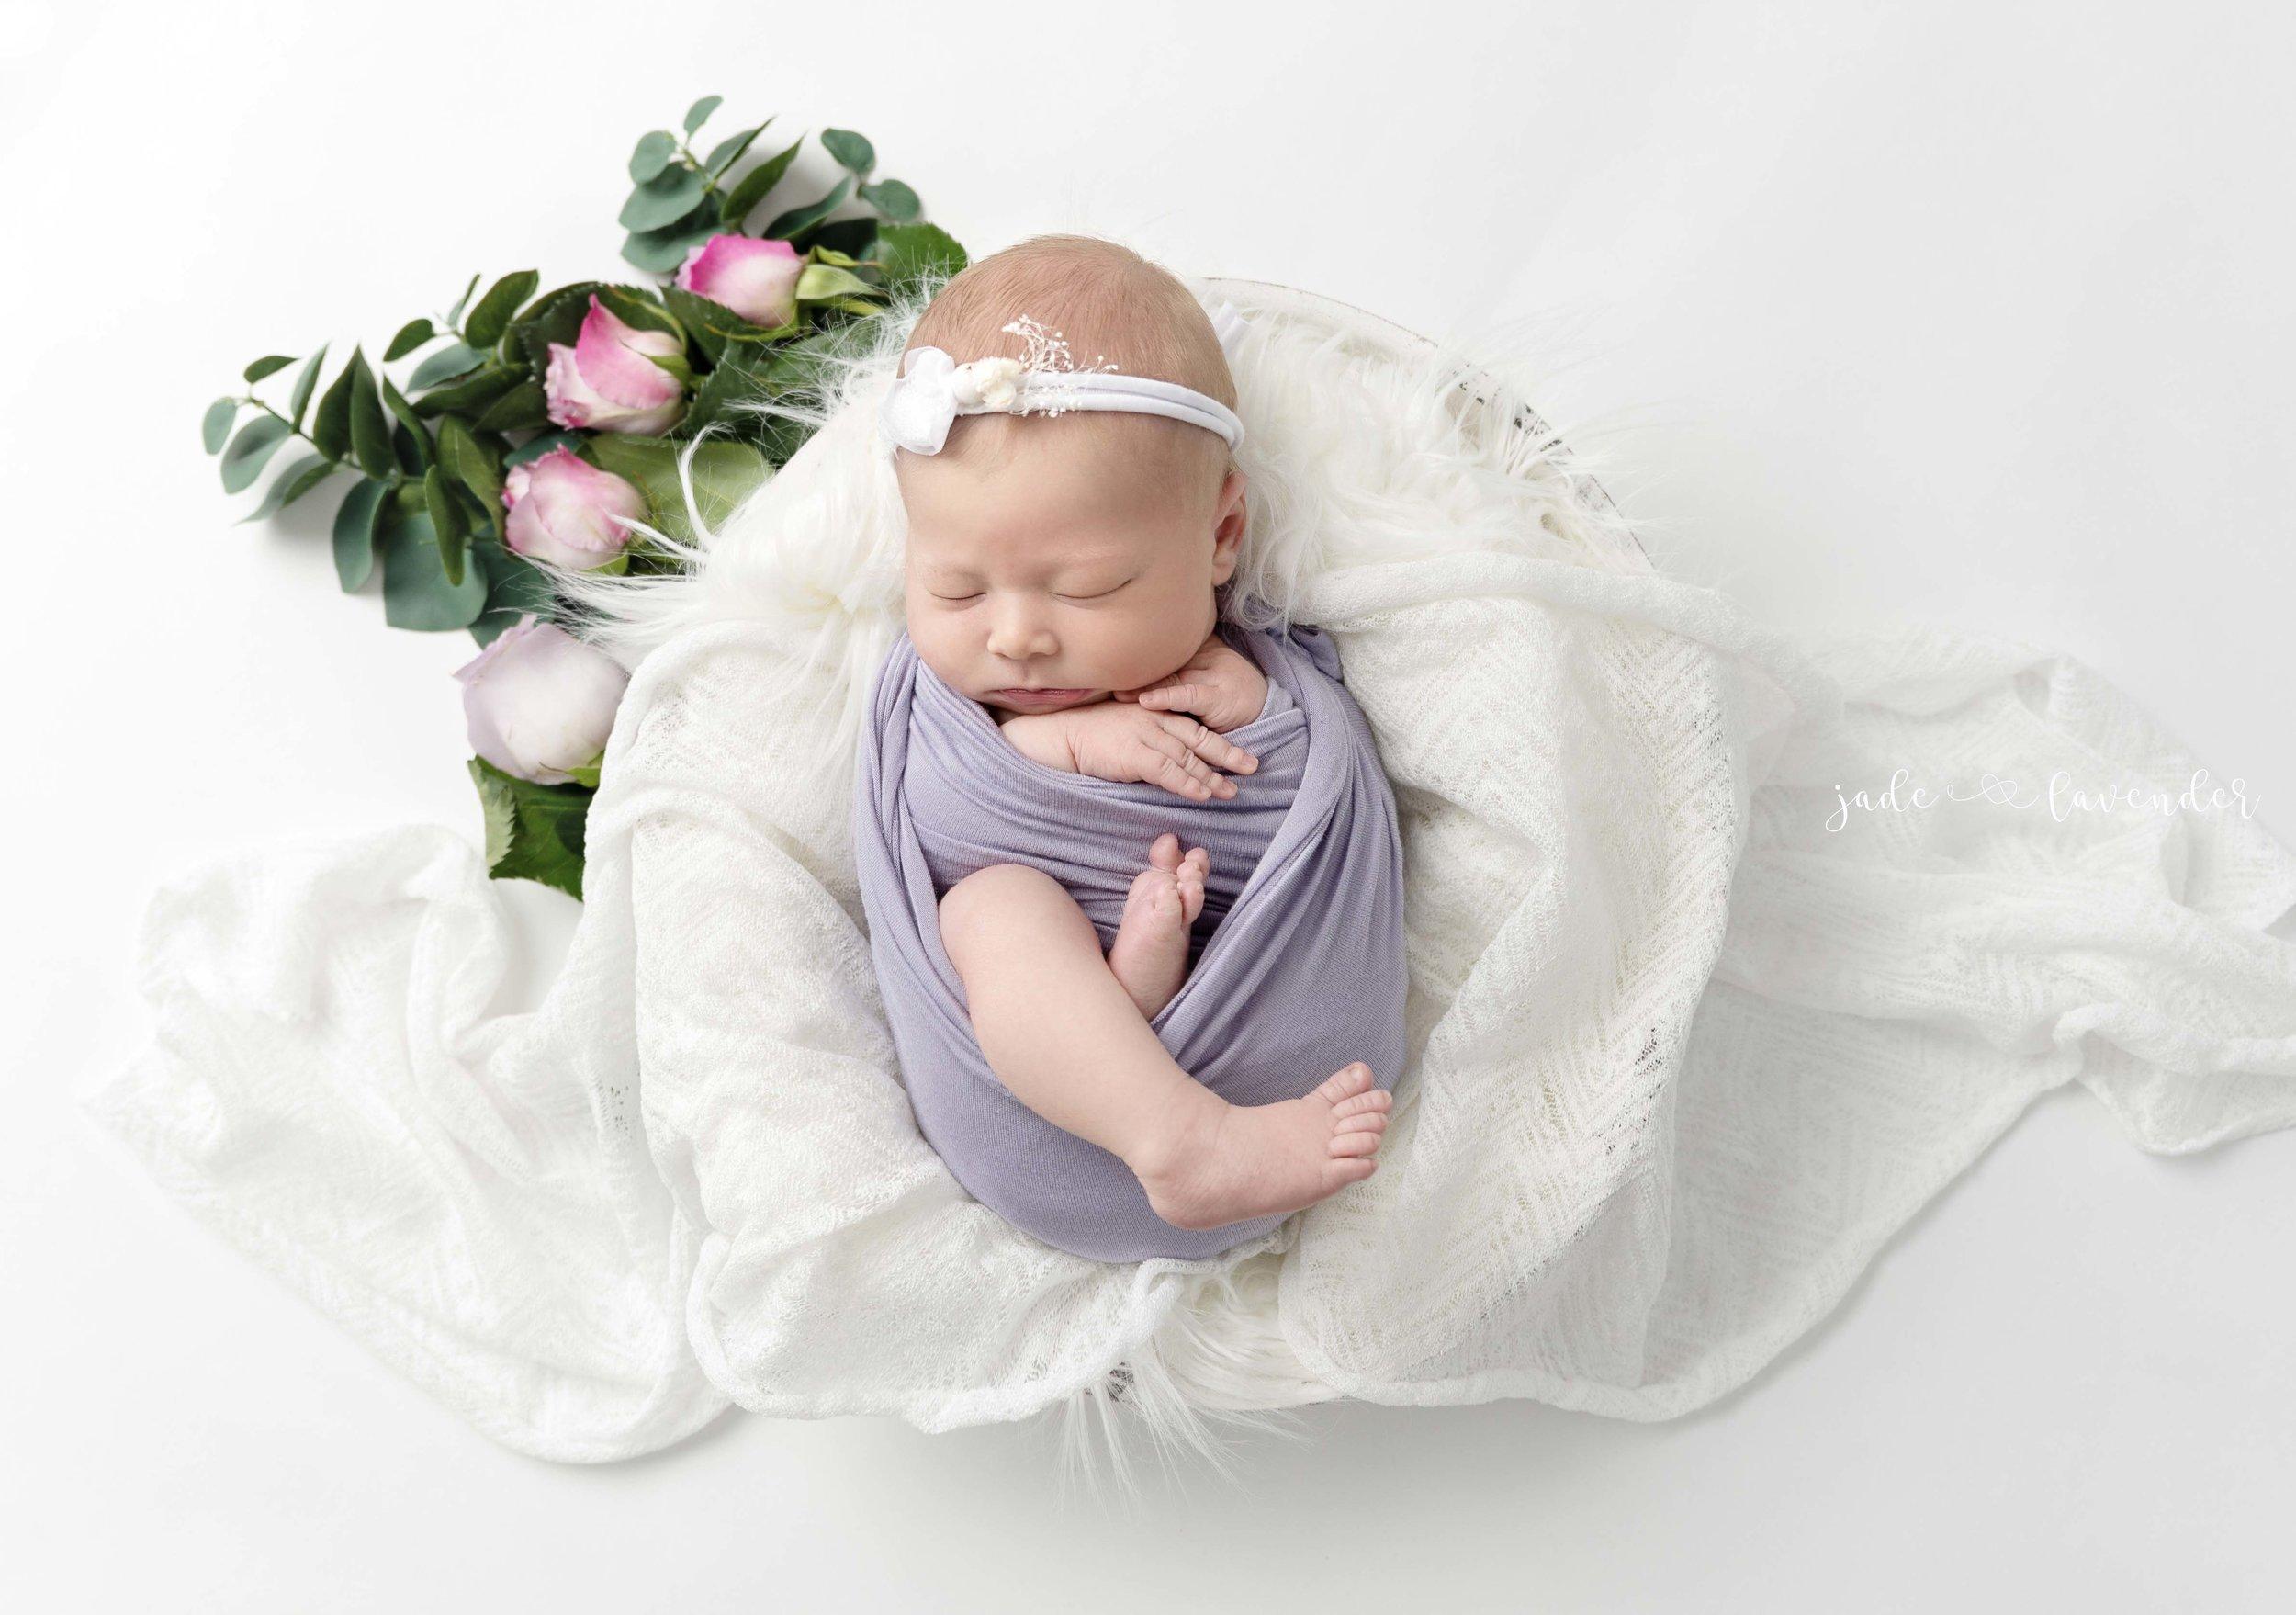 girl-infant-family-photography-baby-photo-studio-newborn-pictures-spokane-washington (5 of 8).jpg